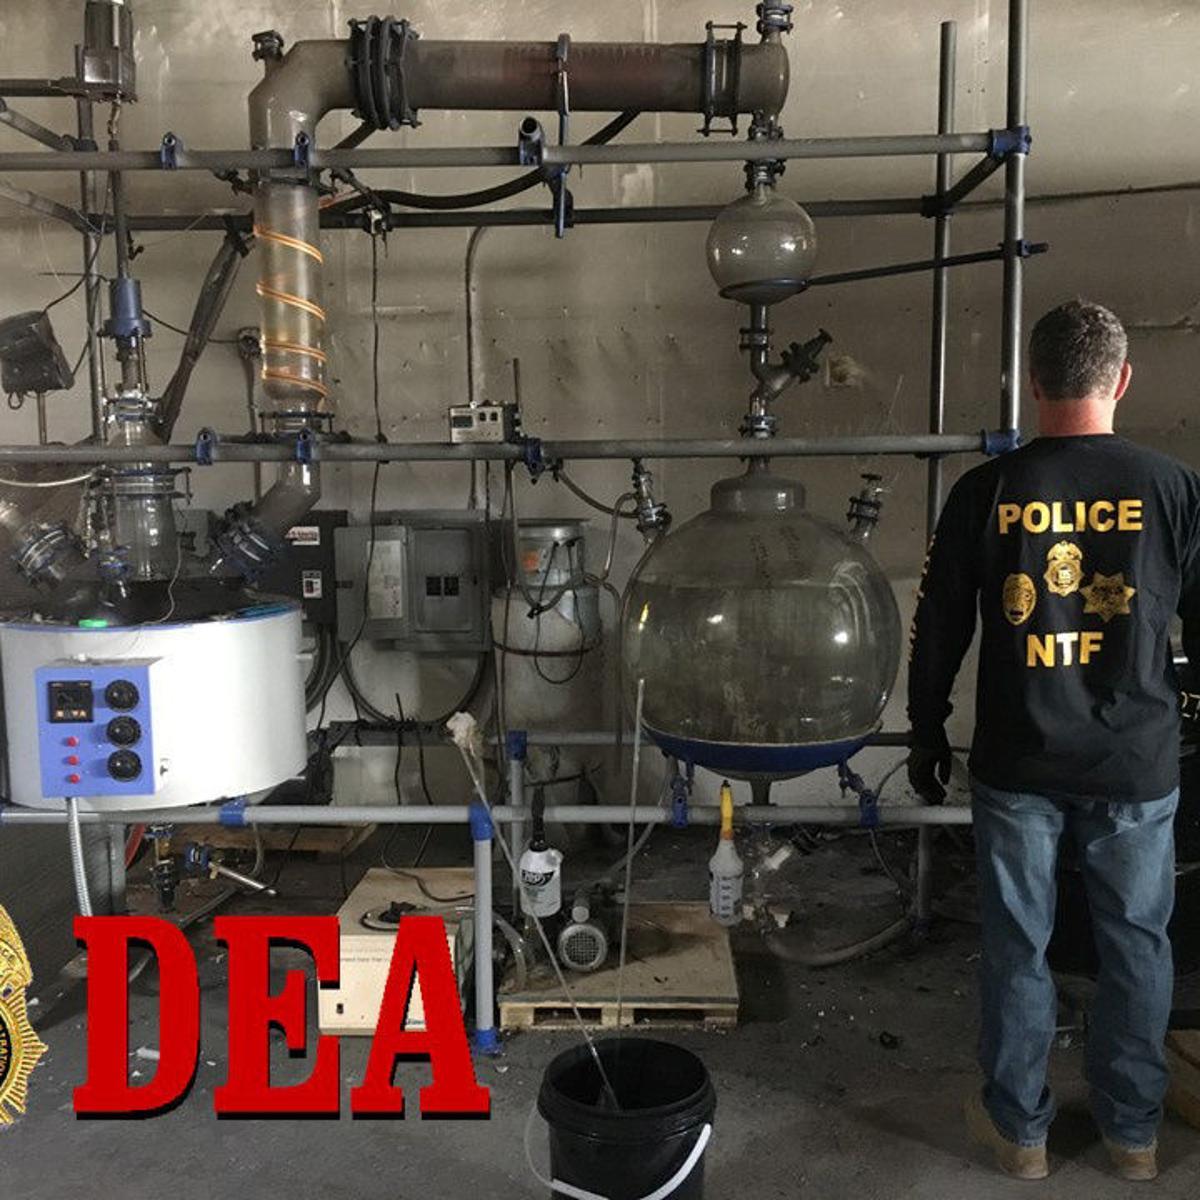 Marijuana oil labs pose deadly, destructive hazard | Law and